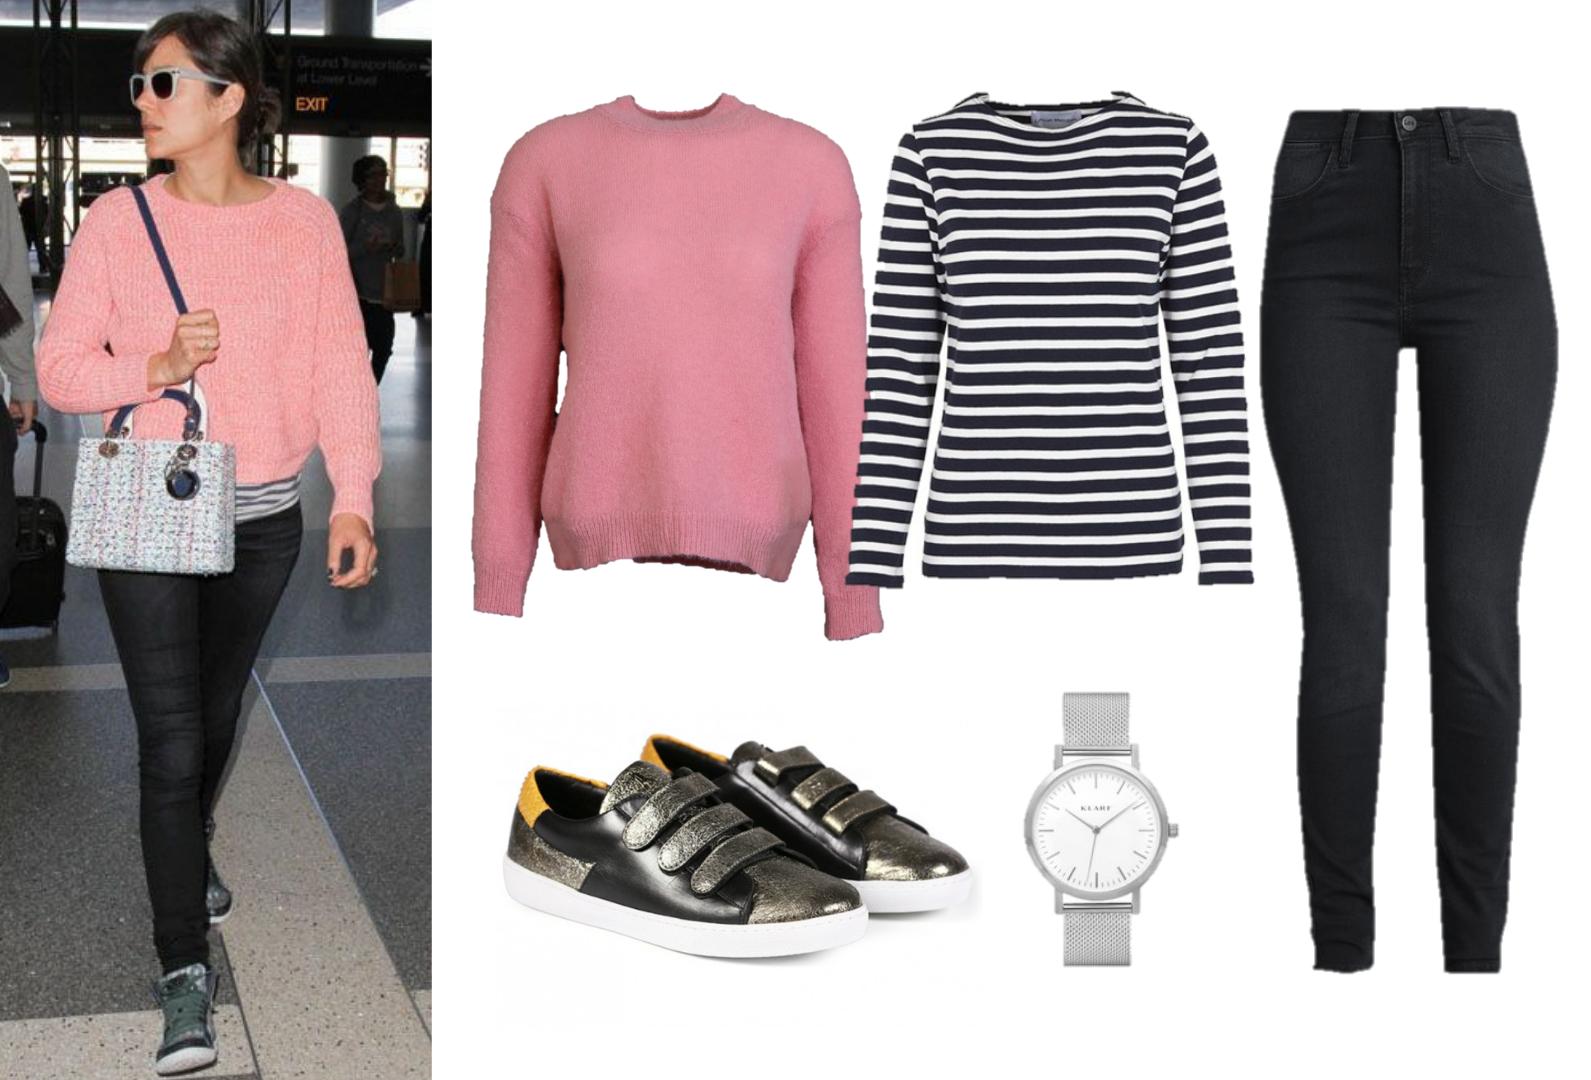 Pull Loreak, Marinière Loreak, Jeans Replay, Baskets Craie, Montre Klarf